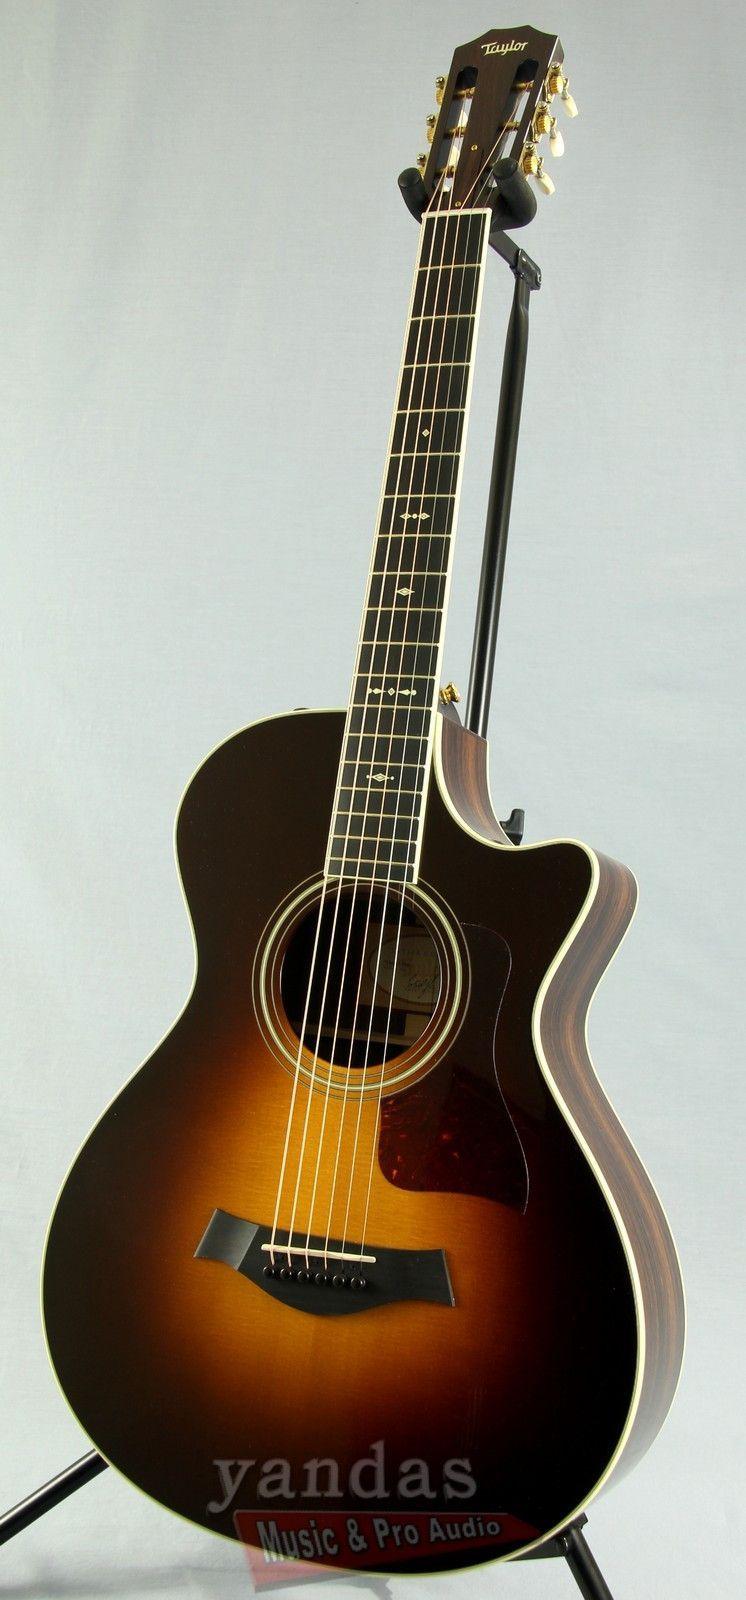 taylor 712ce 12 fret grand concert acoustic electric guitar vintage guitars acoustic music. Black Bedroom Furniture Sets. Home Design Ideas